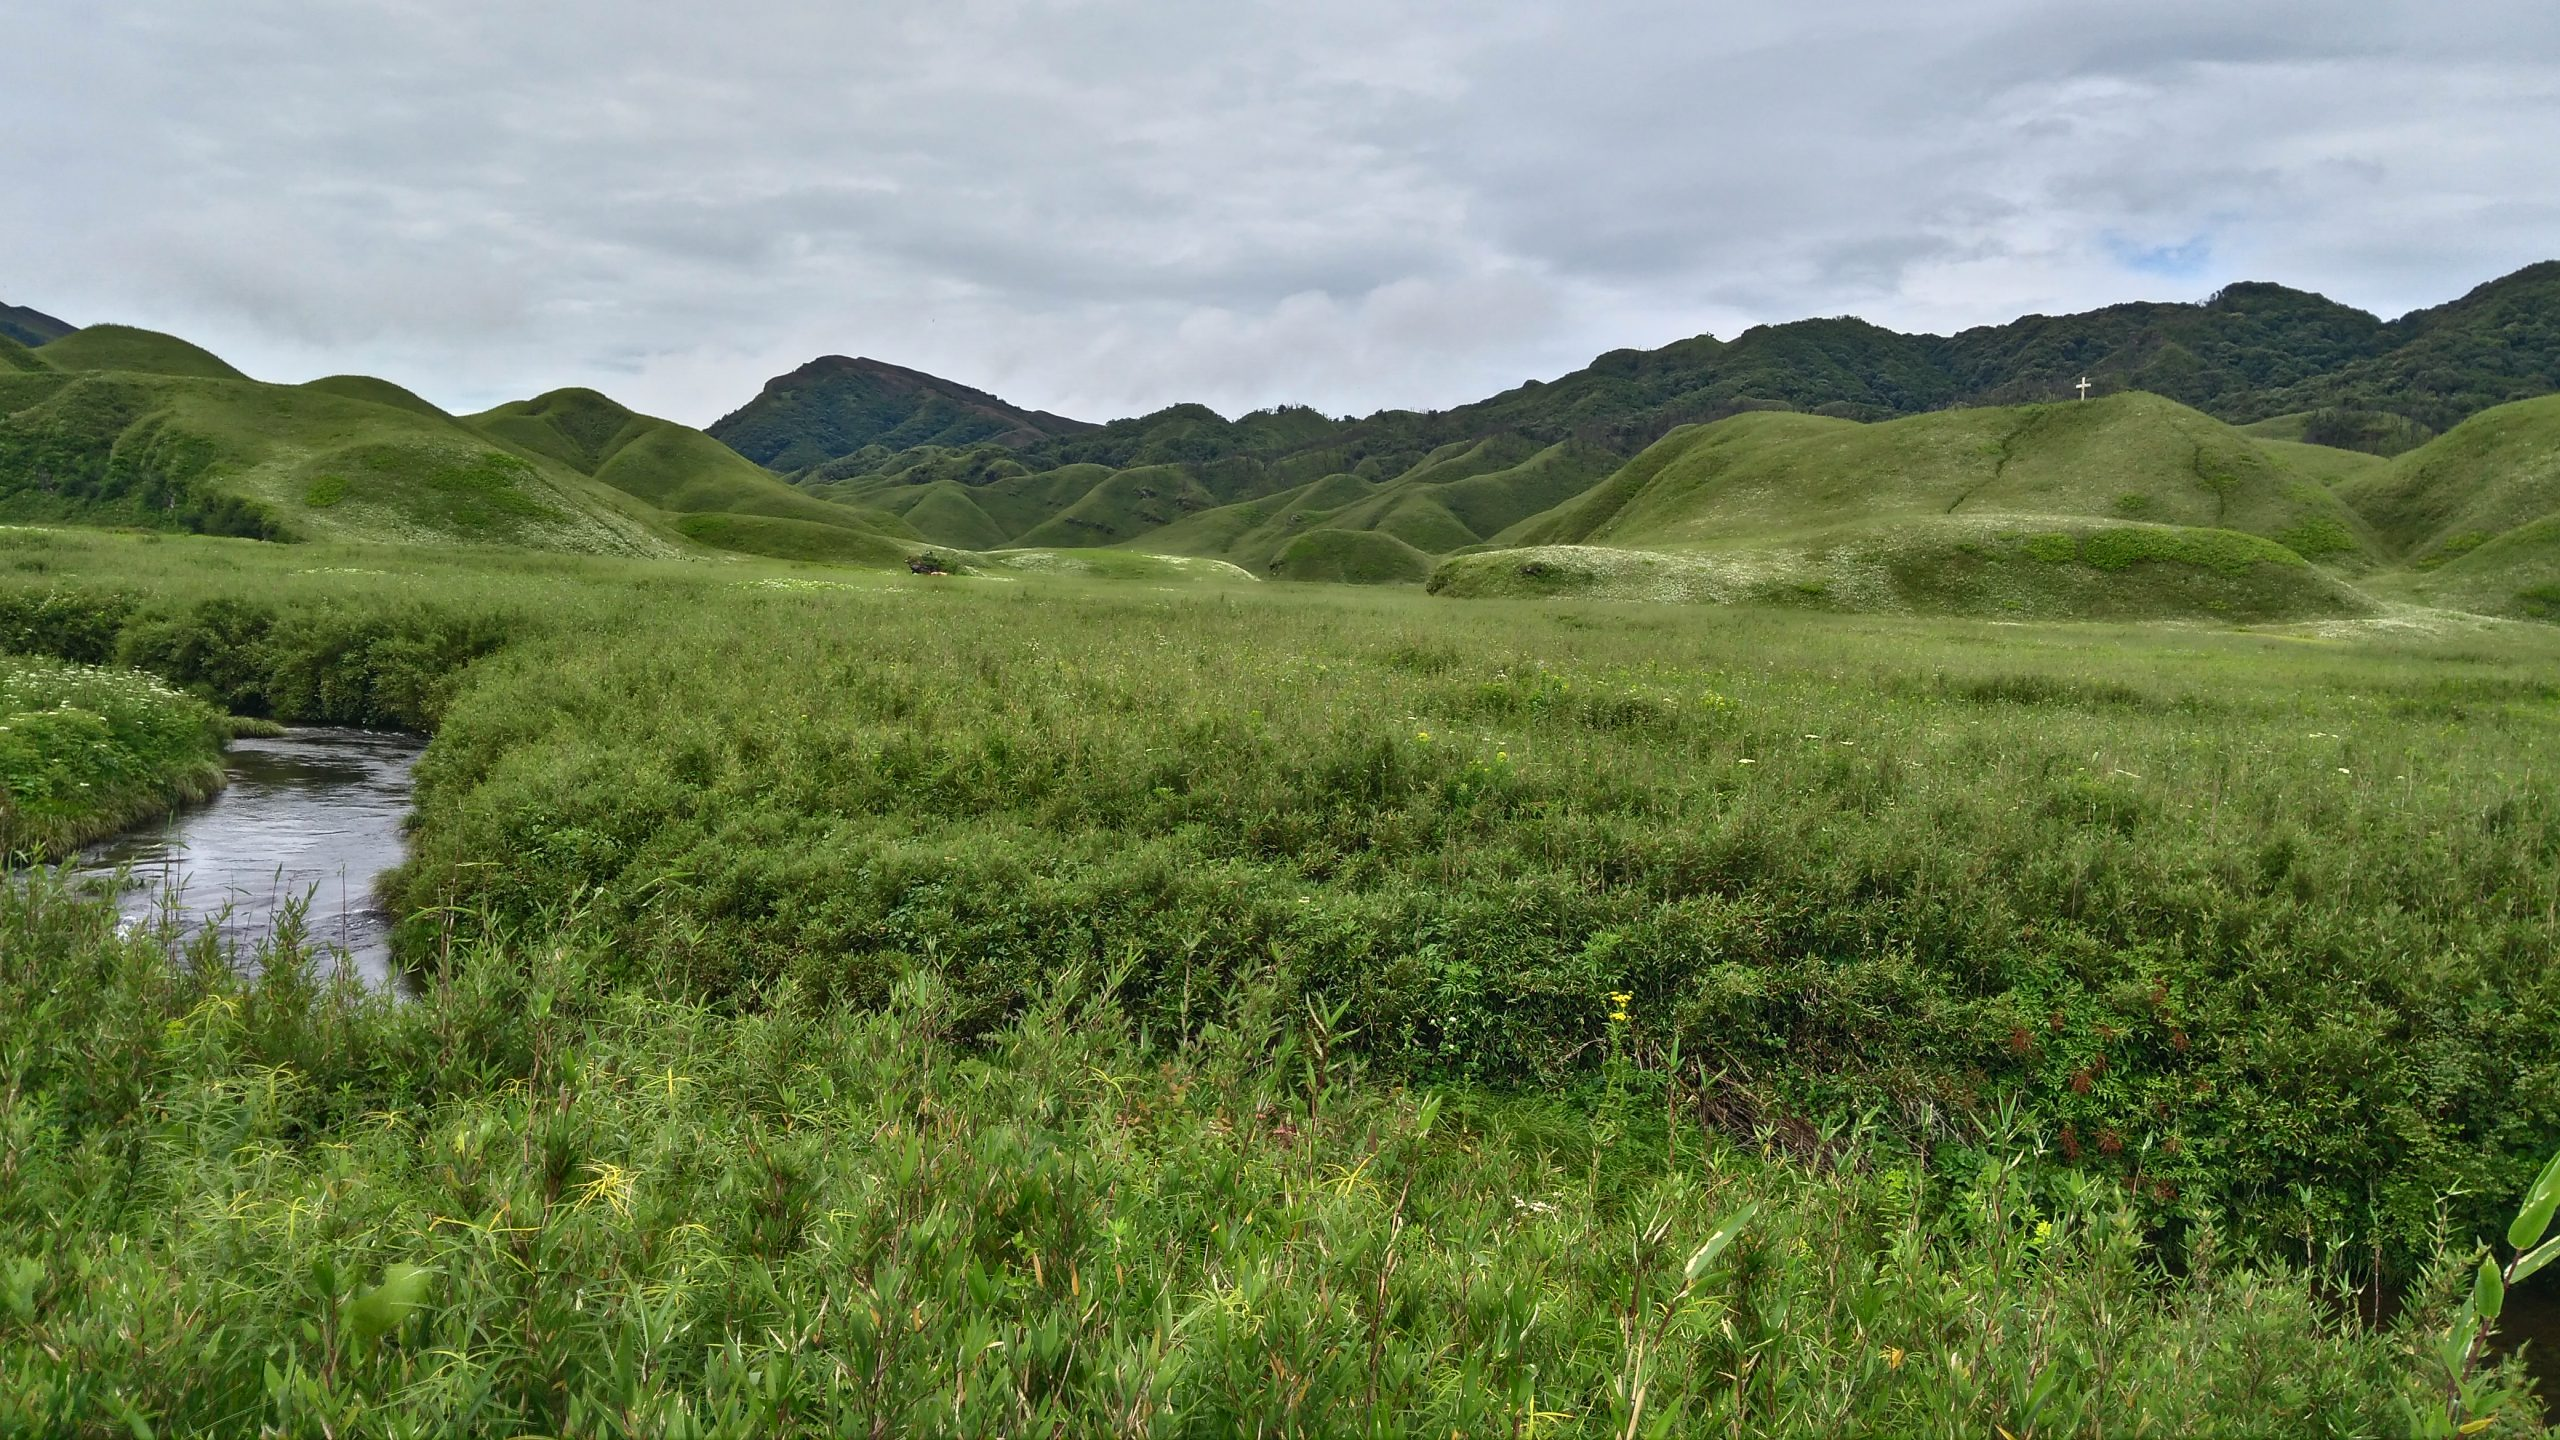 Dzukuo Valley, Nagaland